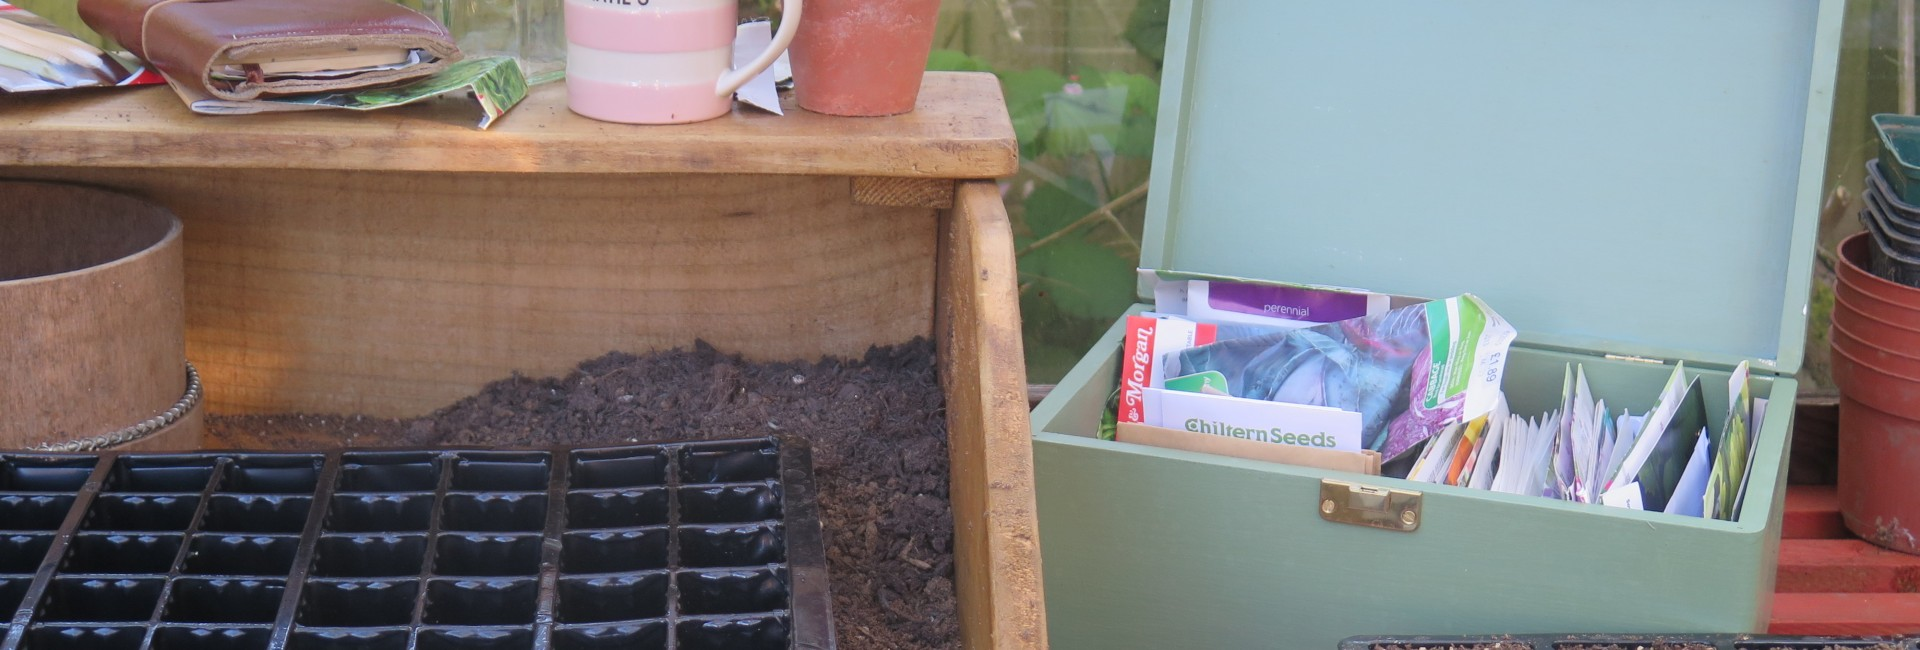 Good Morning Greenhouse!